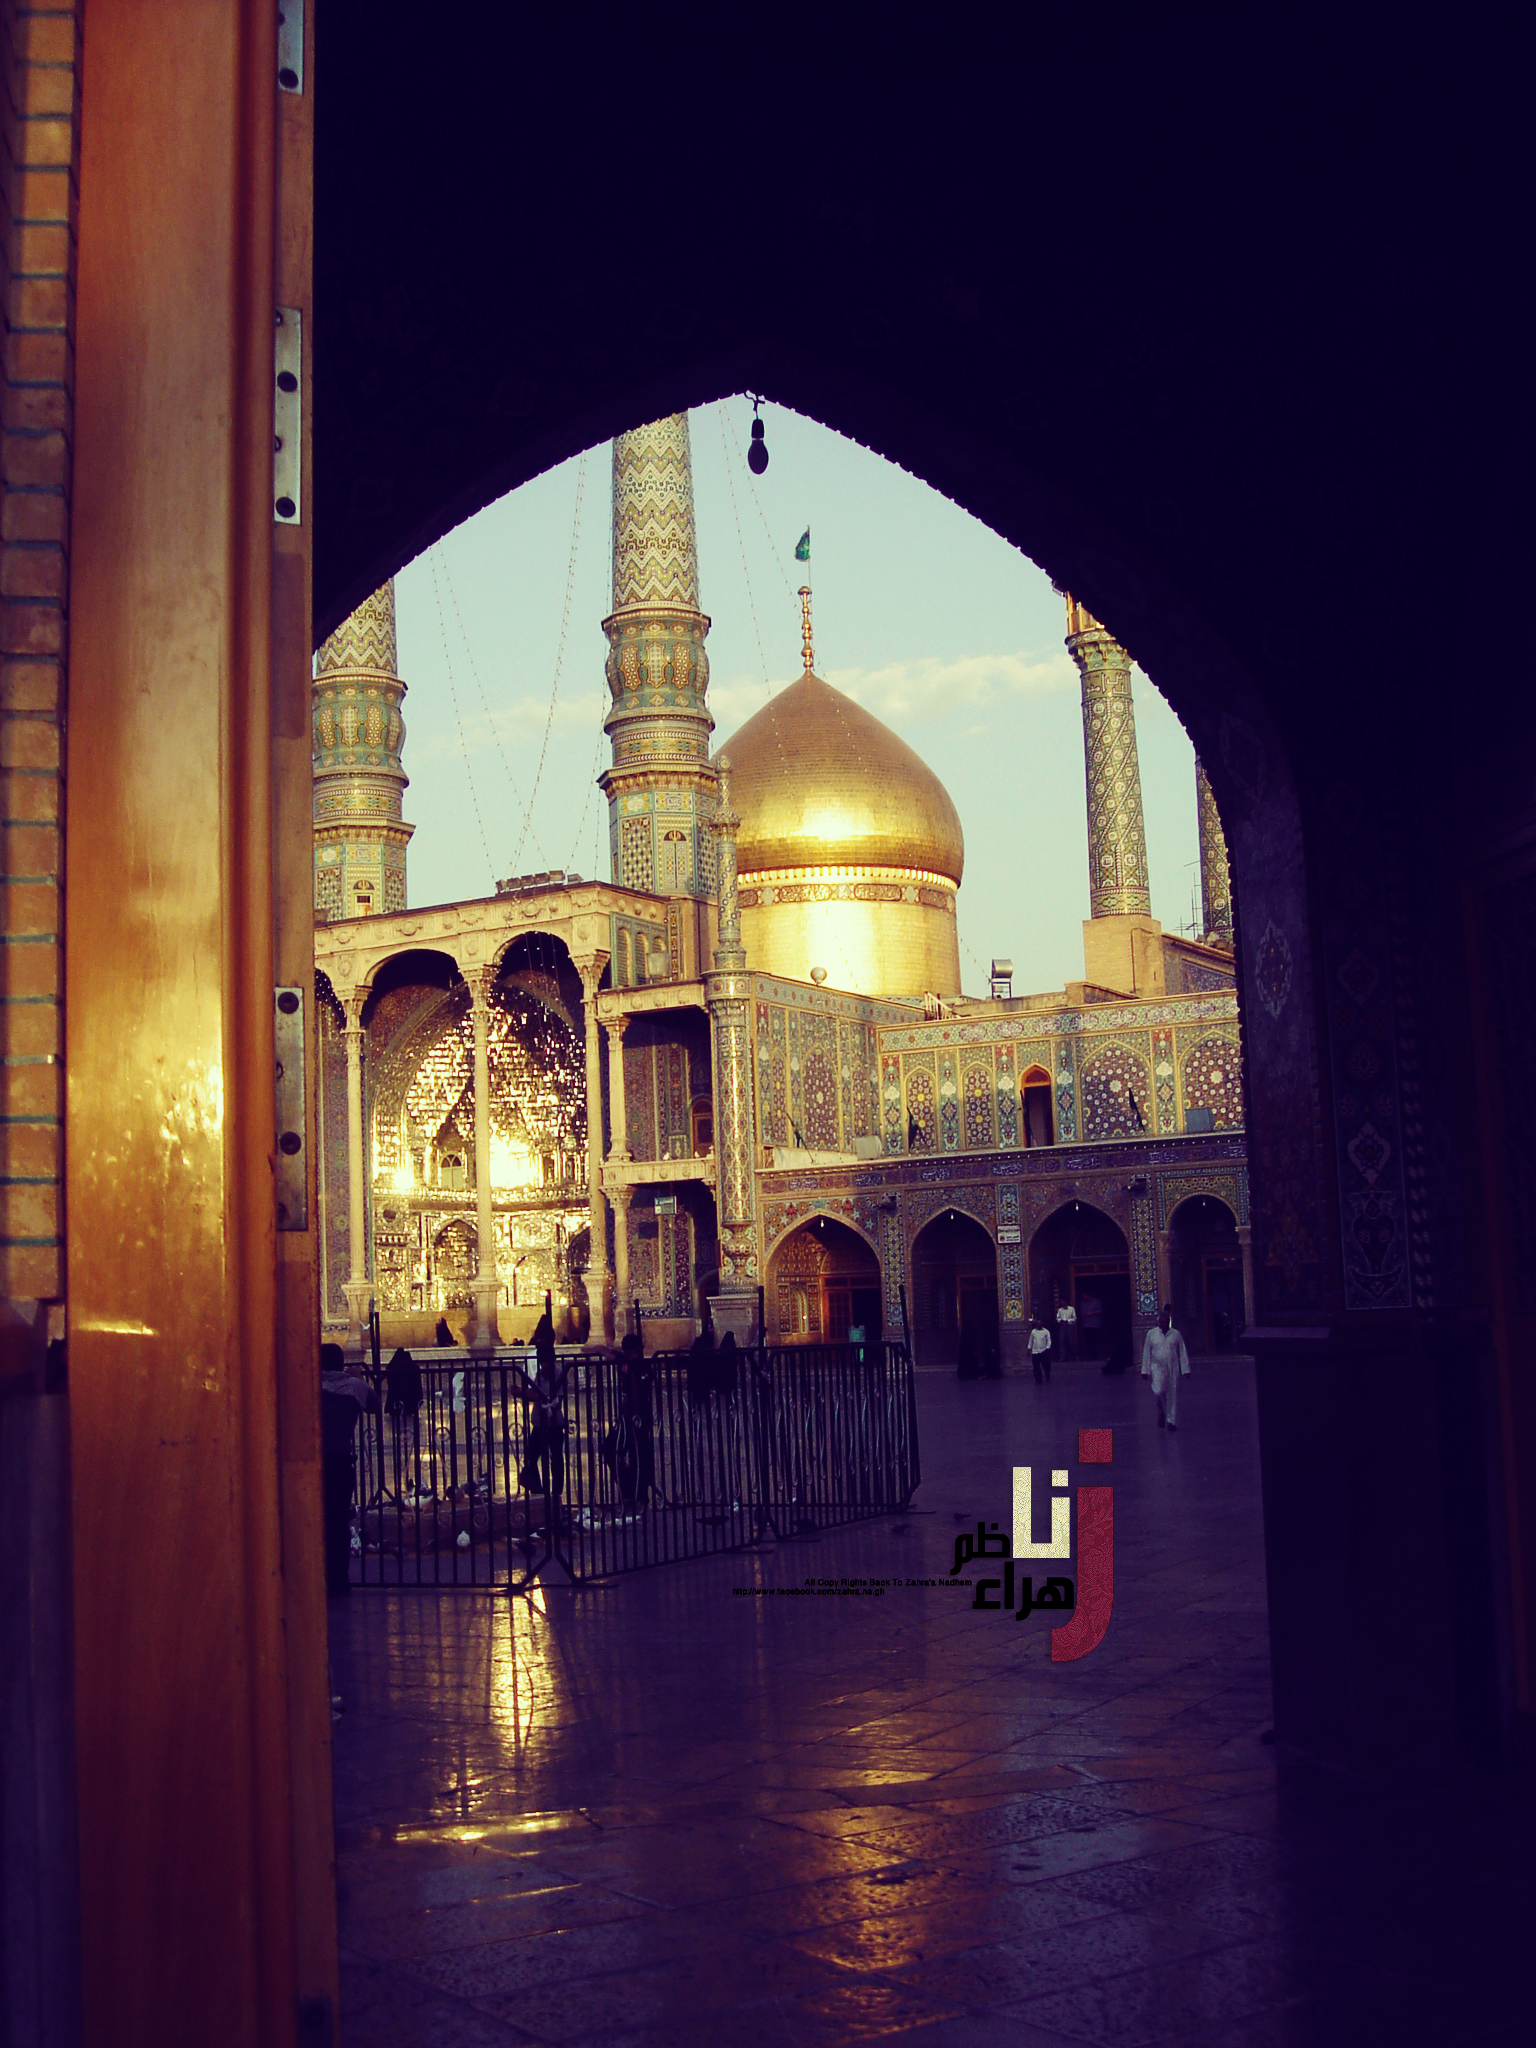 Al-Sayidah Fatimah al-Ma'asoma by zahoor-ng